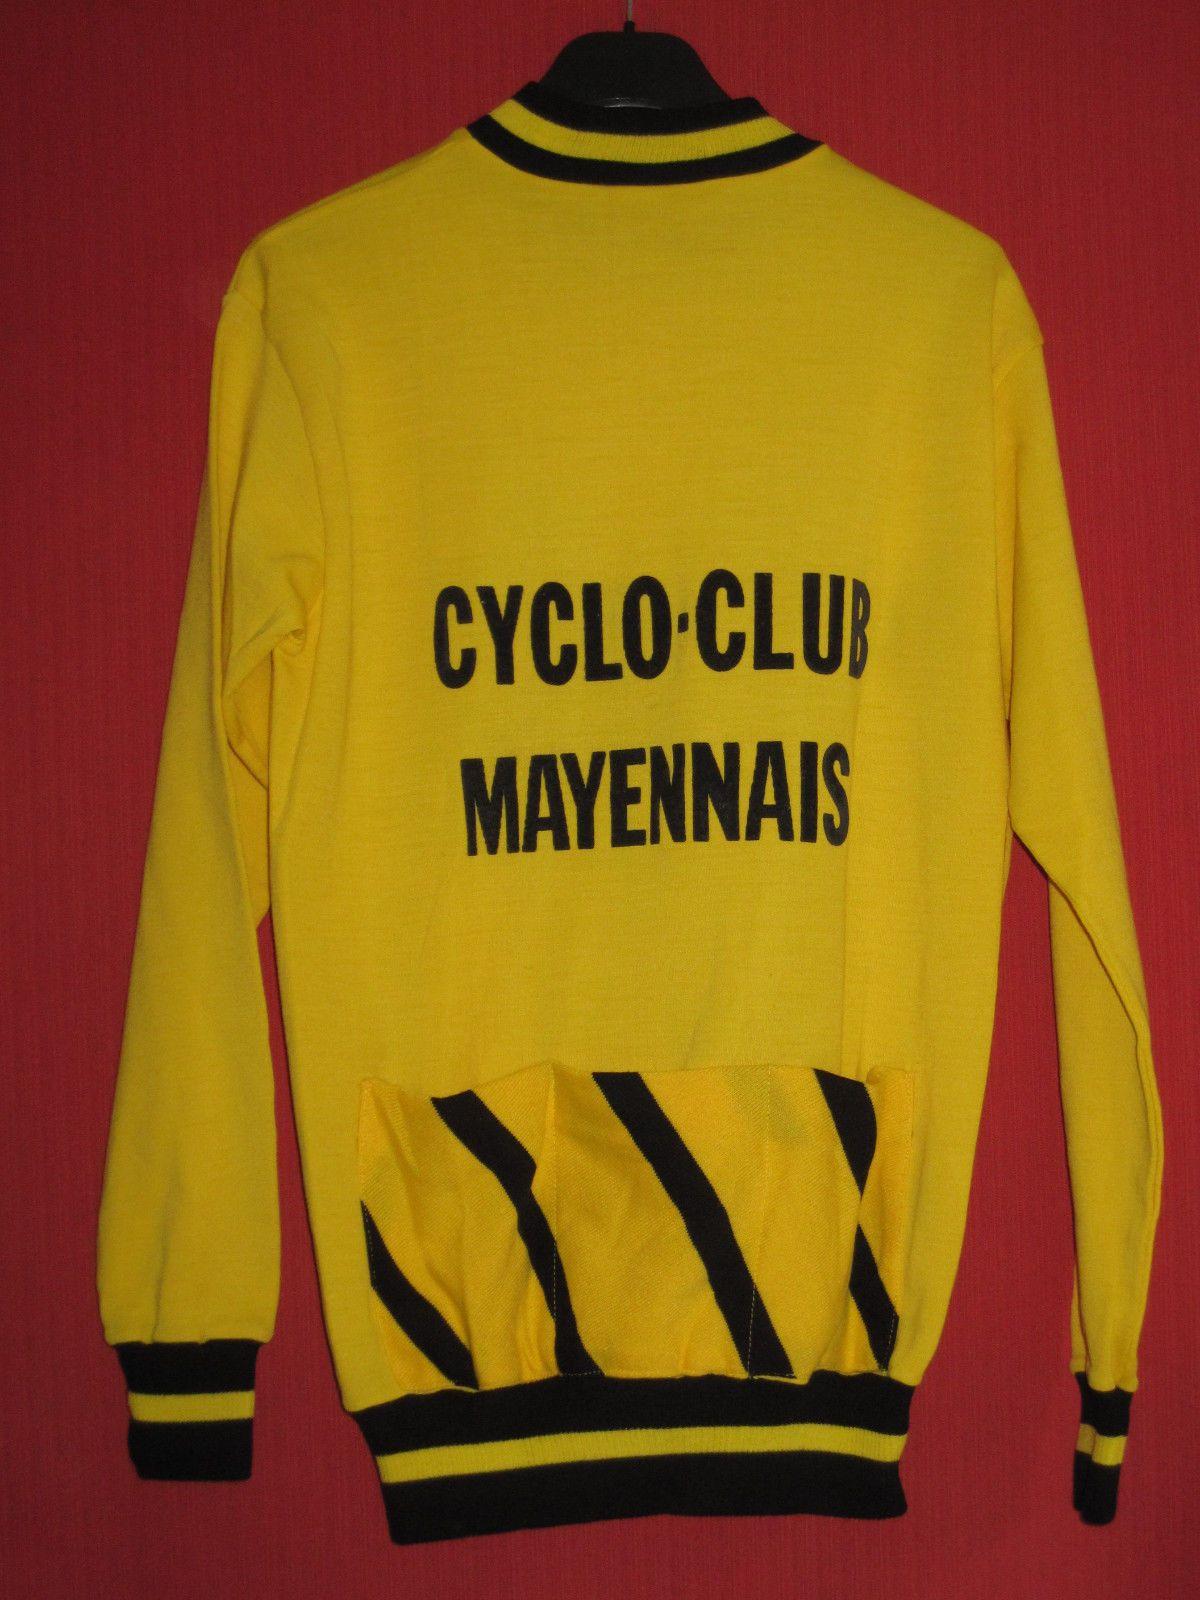 20622c651 T Shirts · Maillot cycliste Cyclo Club Mayennais Bennes Marrel Garnier  Vintage - 5